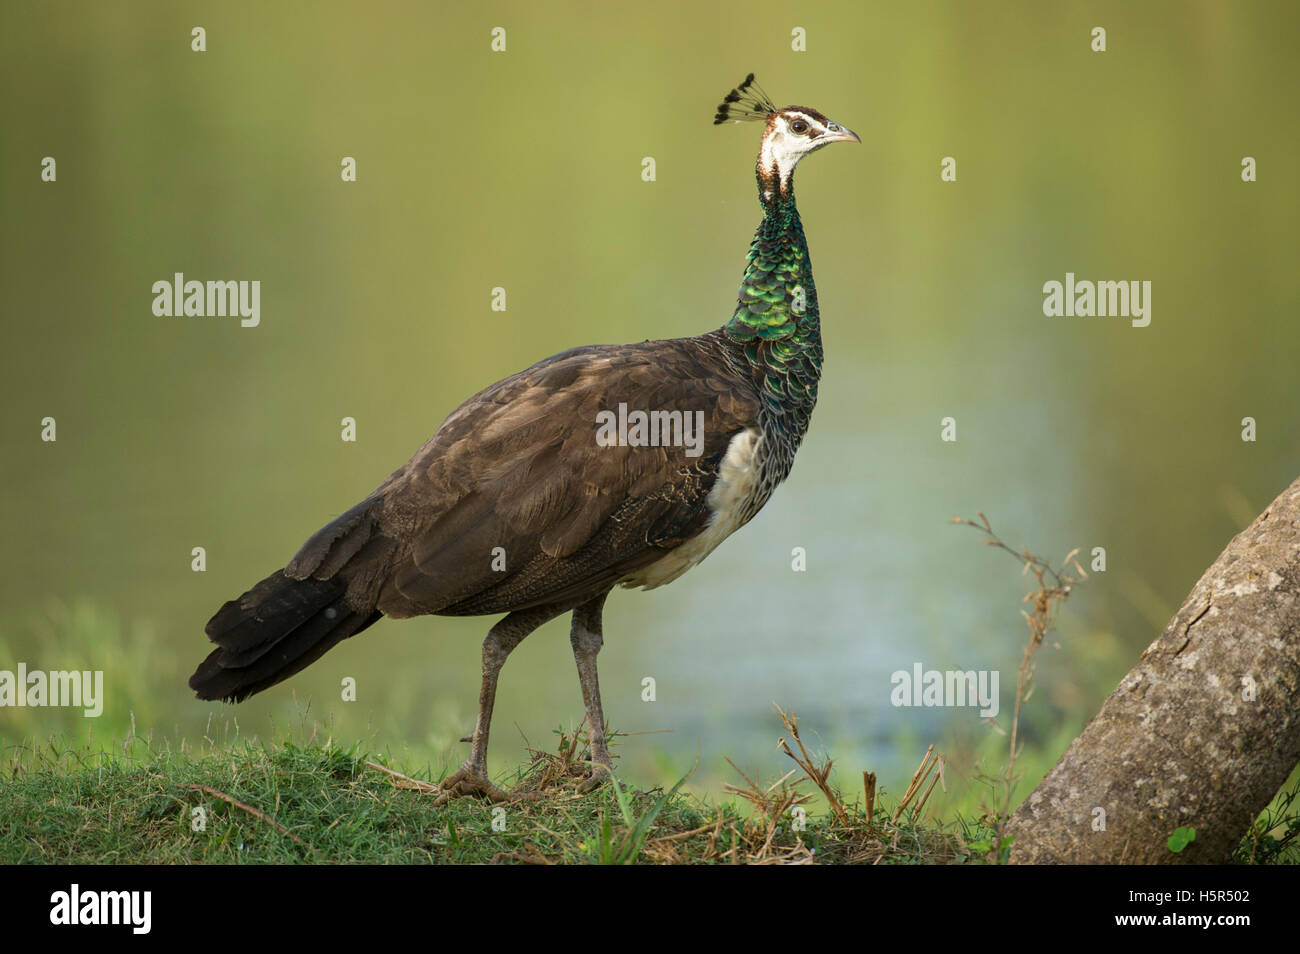 Indian peafowl, Pavo cristatus, Yala National Park, Sri Lanka - Stock Image